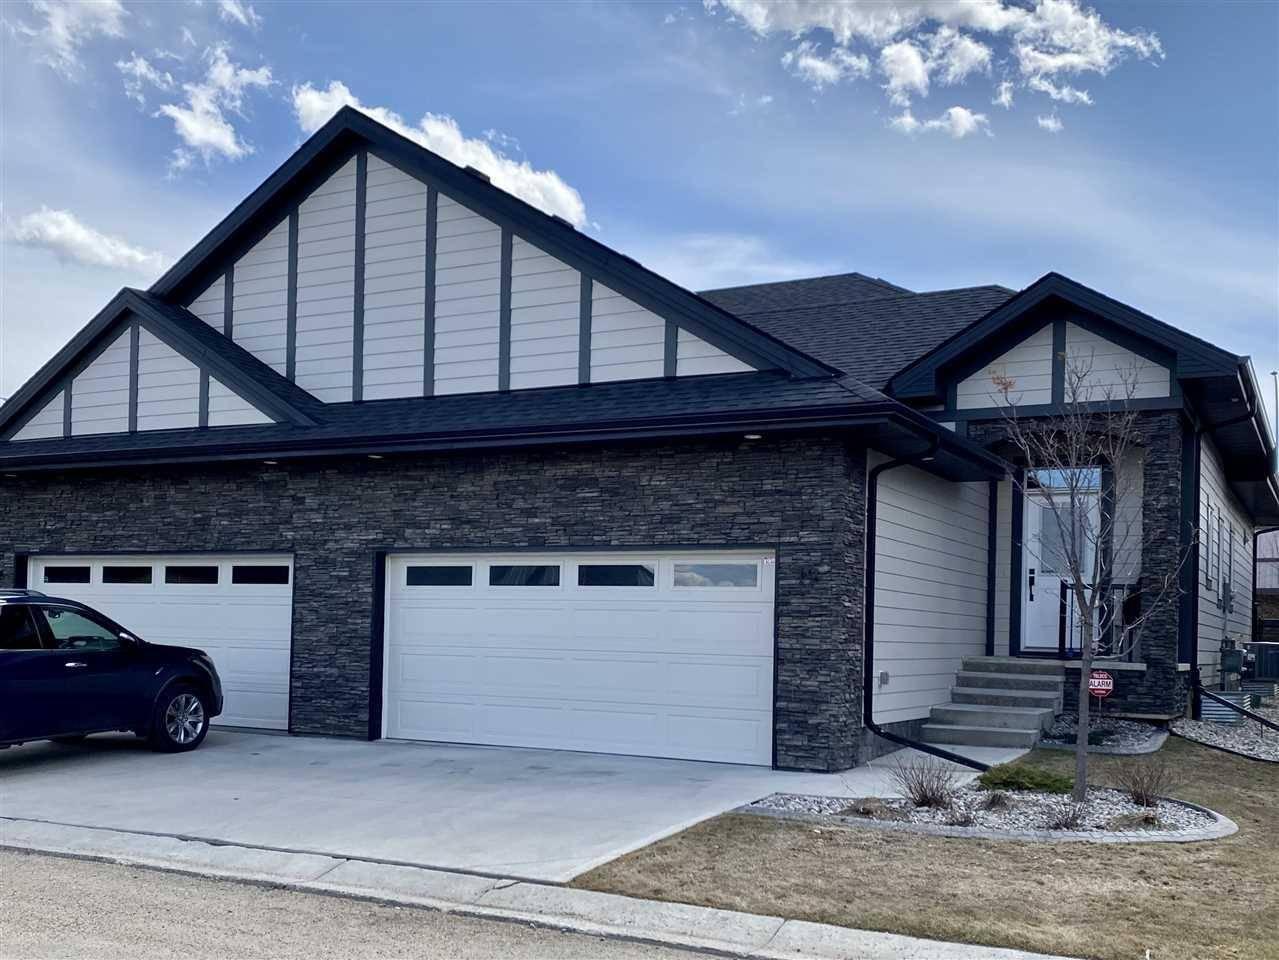 Townhouse for sale at 19 Signature Cv  Sherwood Park Alberta - MLS: E4194056